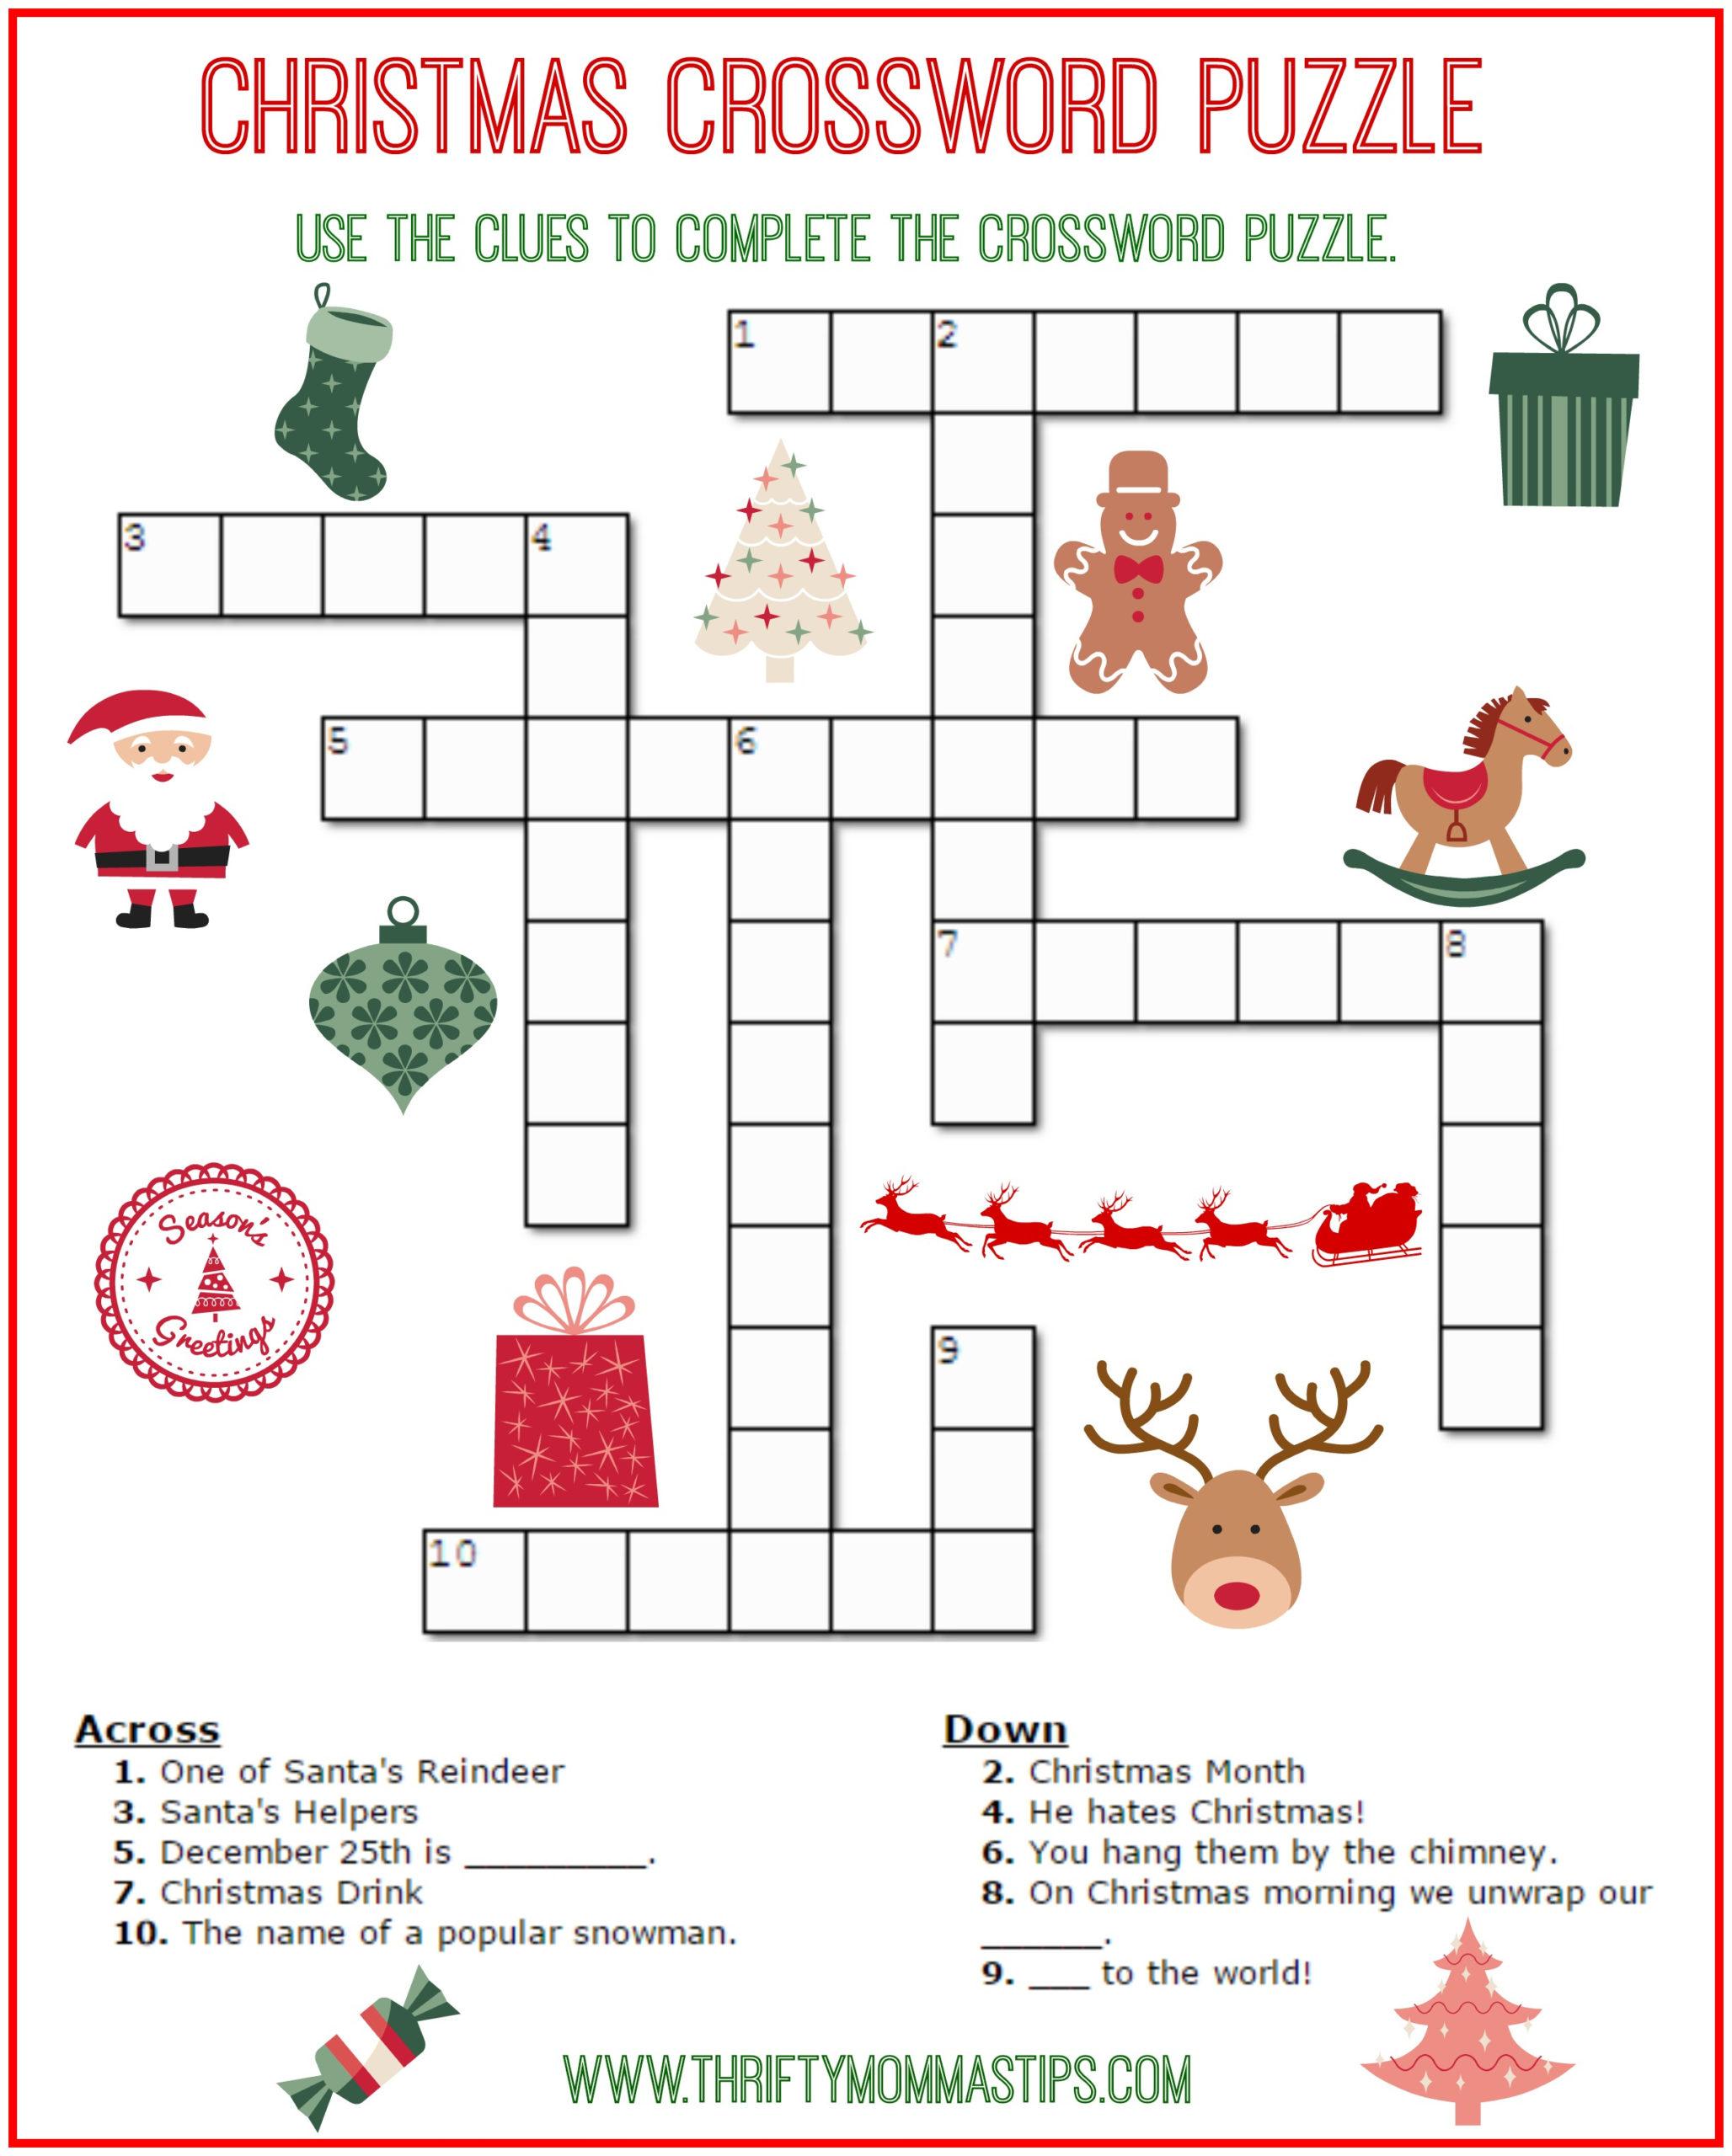 Christmas Crossword Puzzle Free Printable